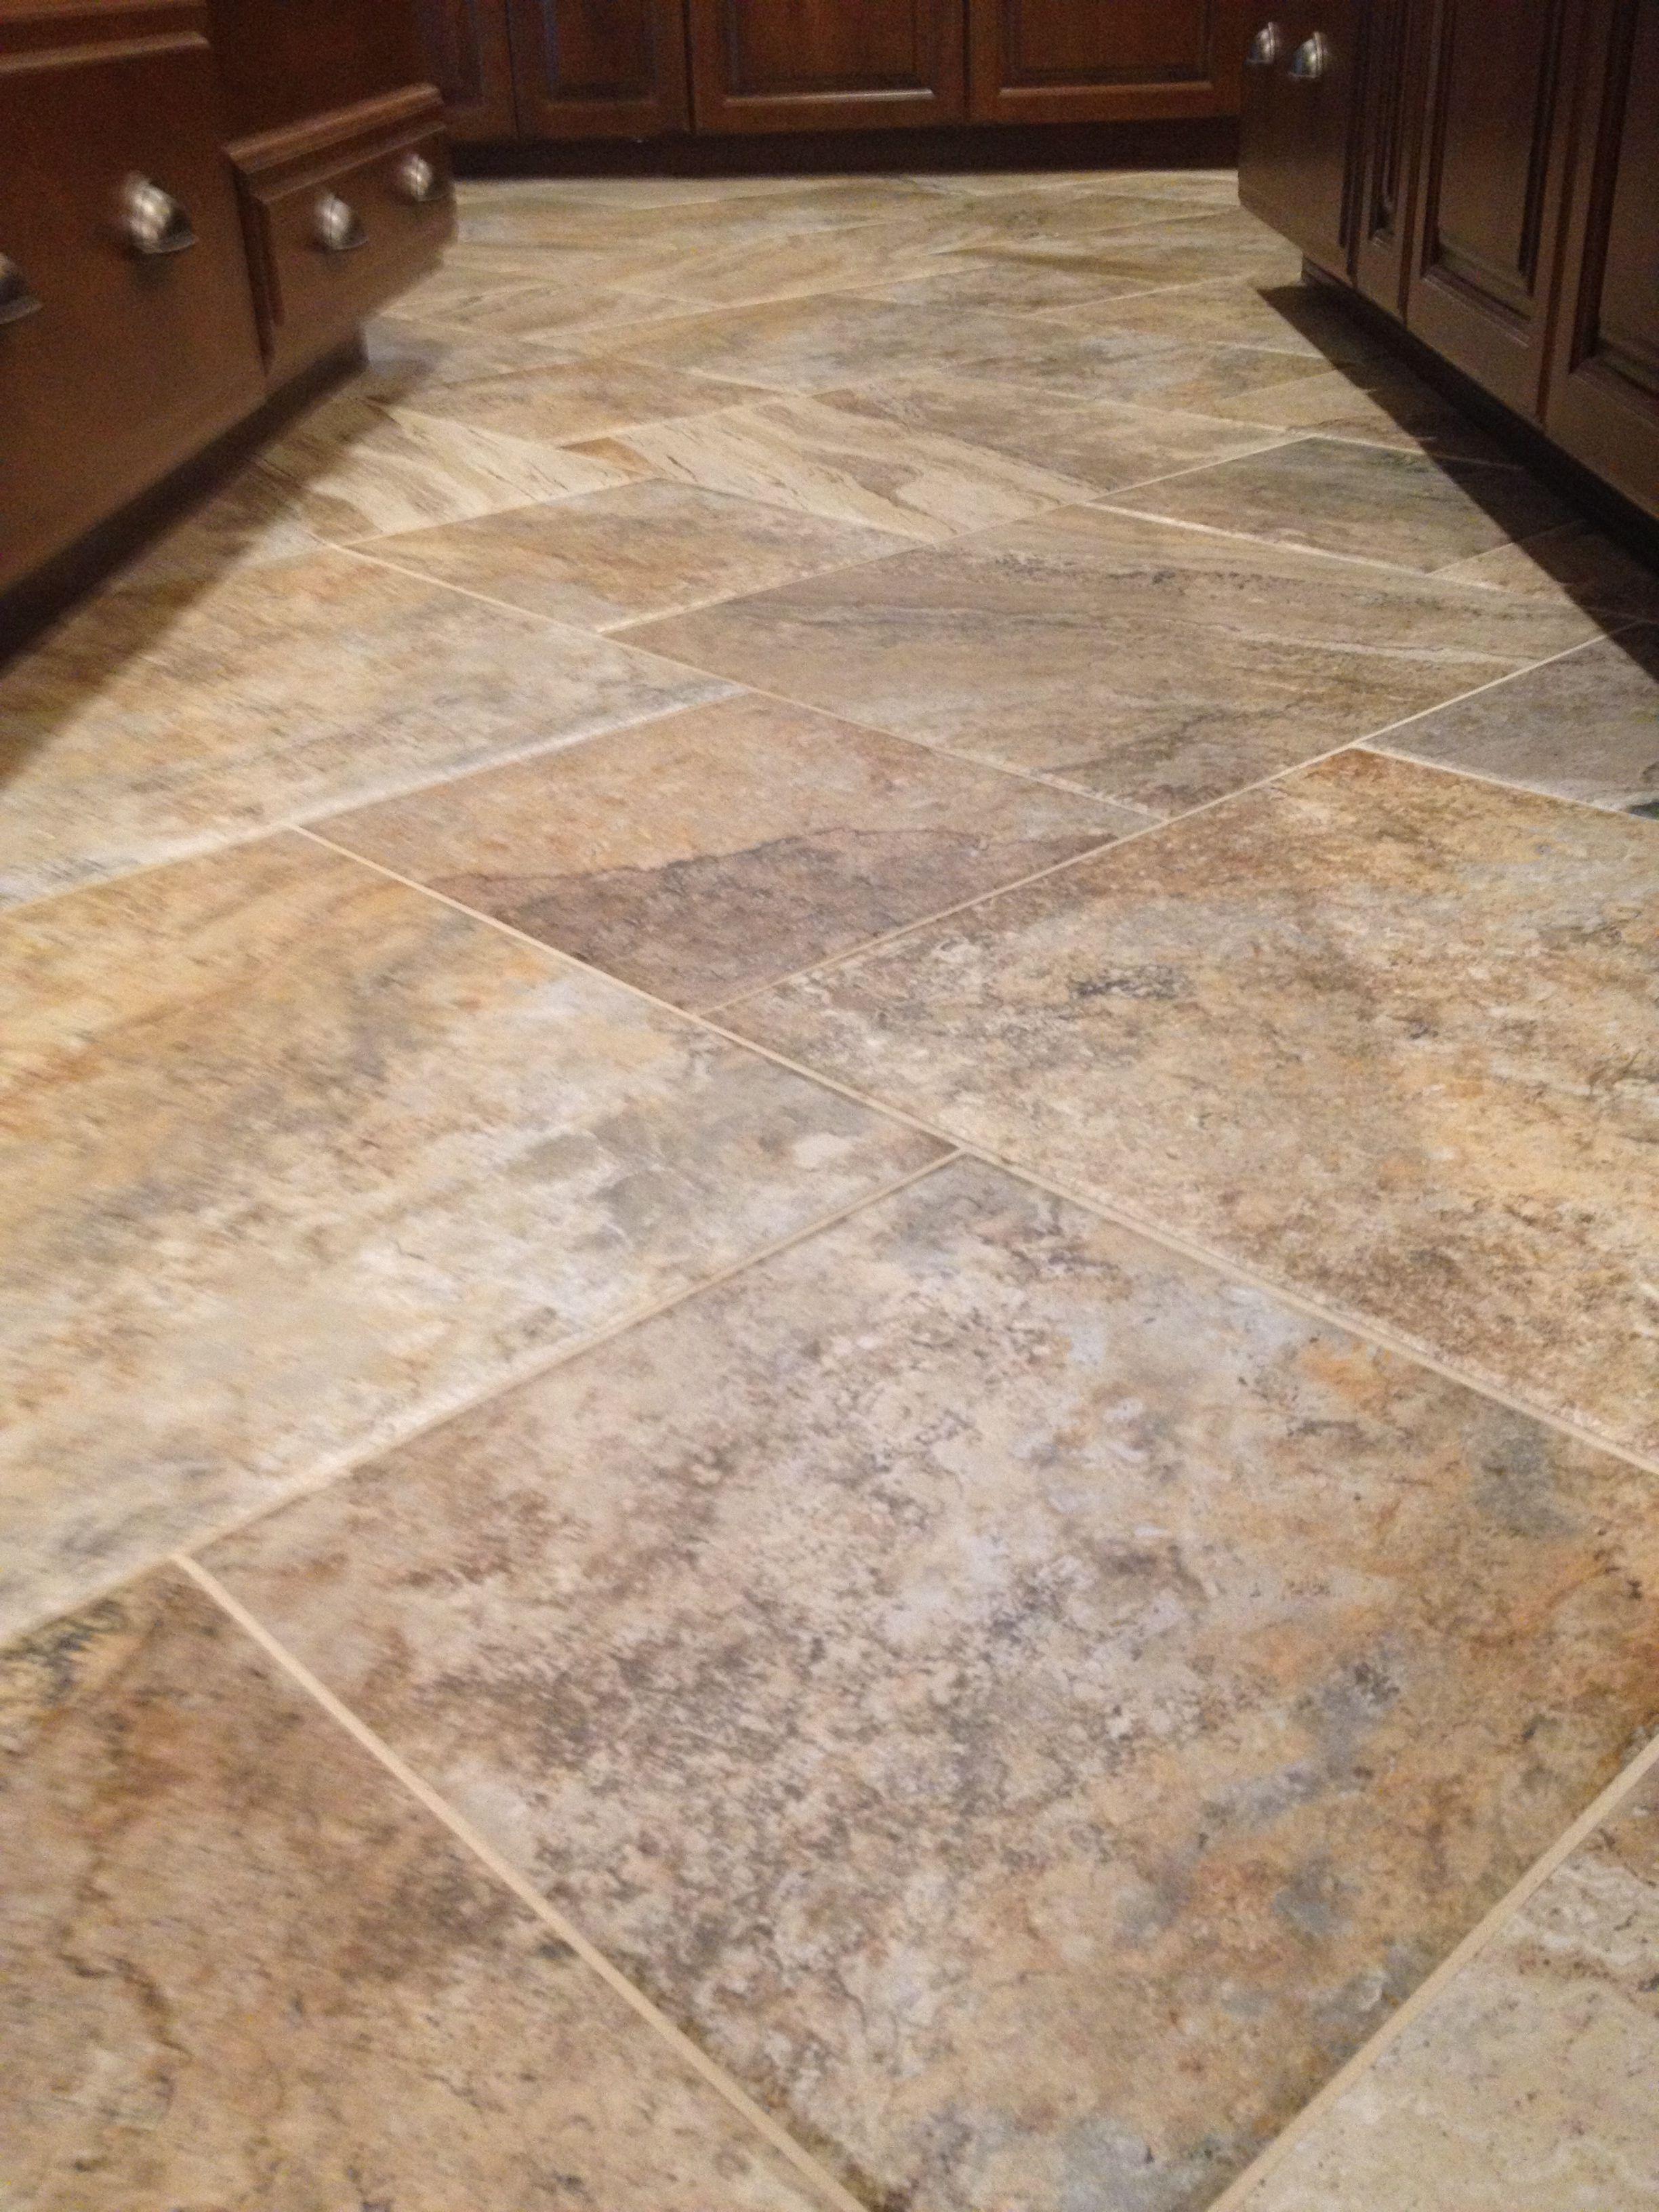 Tile Patterns 13x13 With 18x18 Pinwheel Tile Design Pattern Floor Tile Design Kitchen Flooring